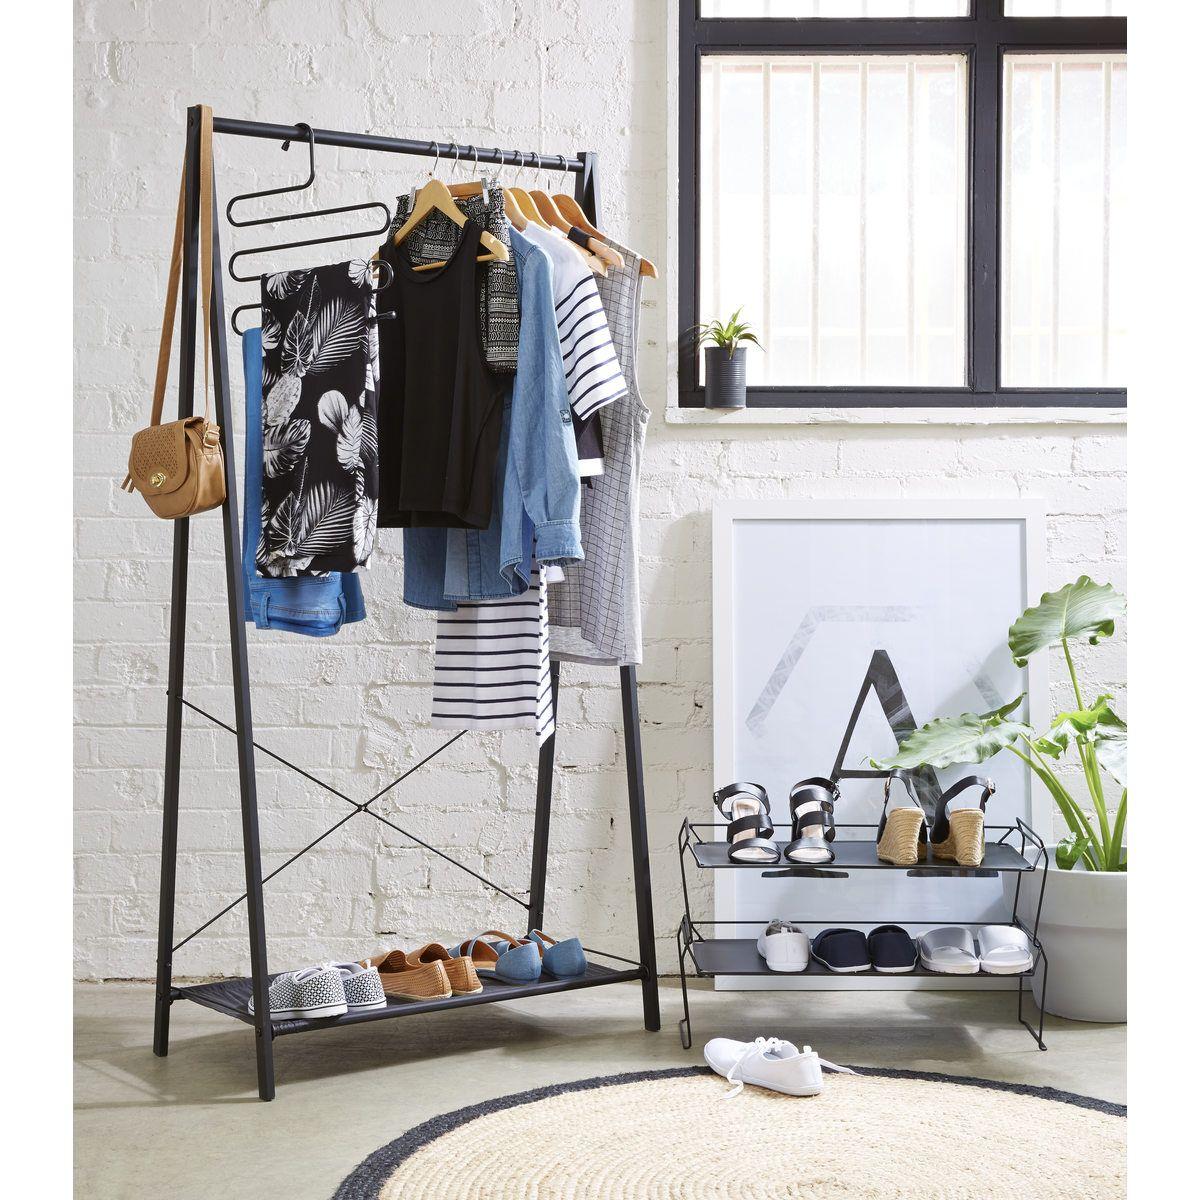 A Frame Garment Rack Black Kmart Garment Racks Clothing Rack Room Setup